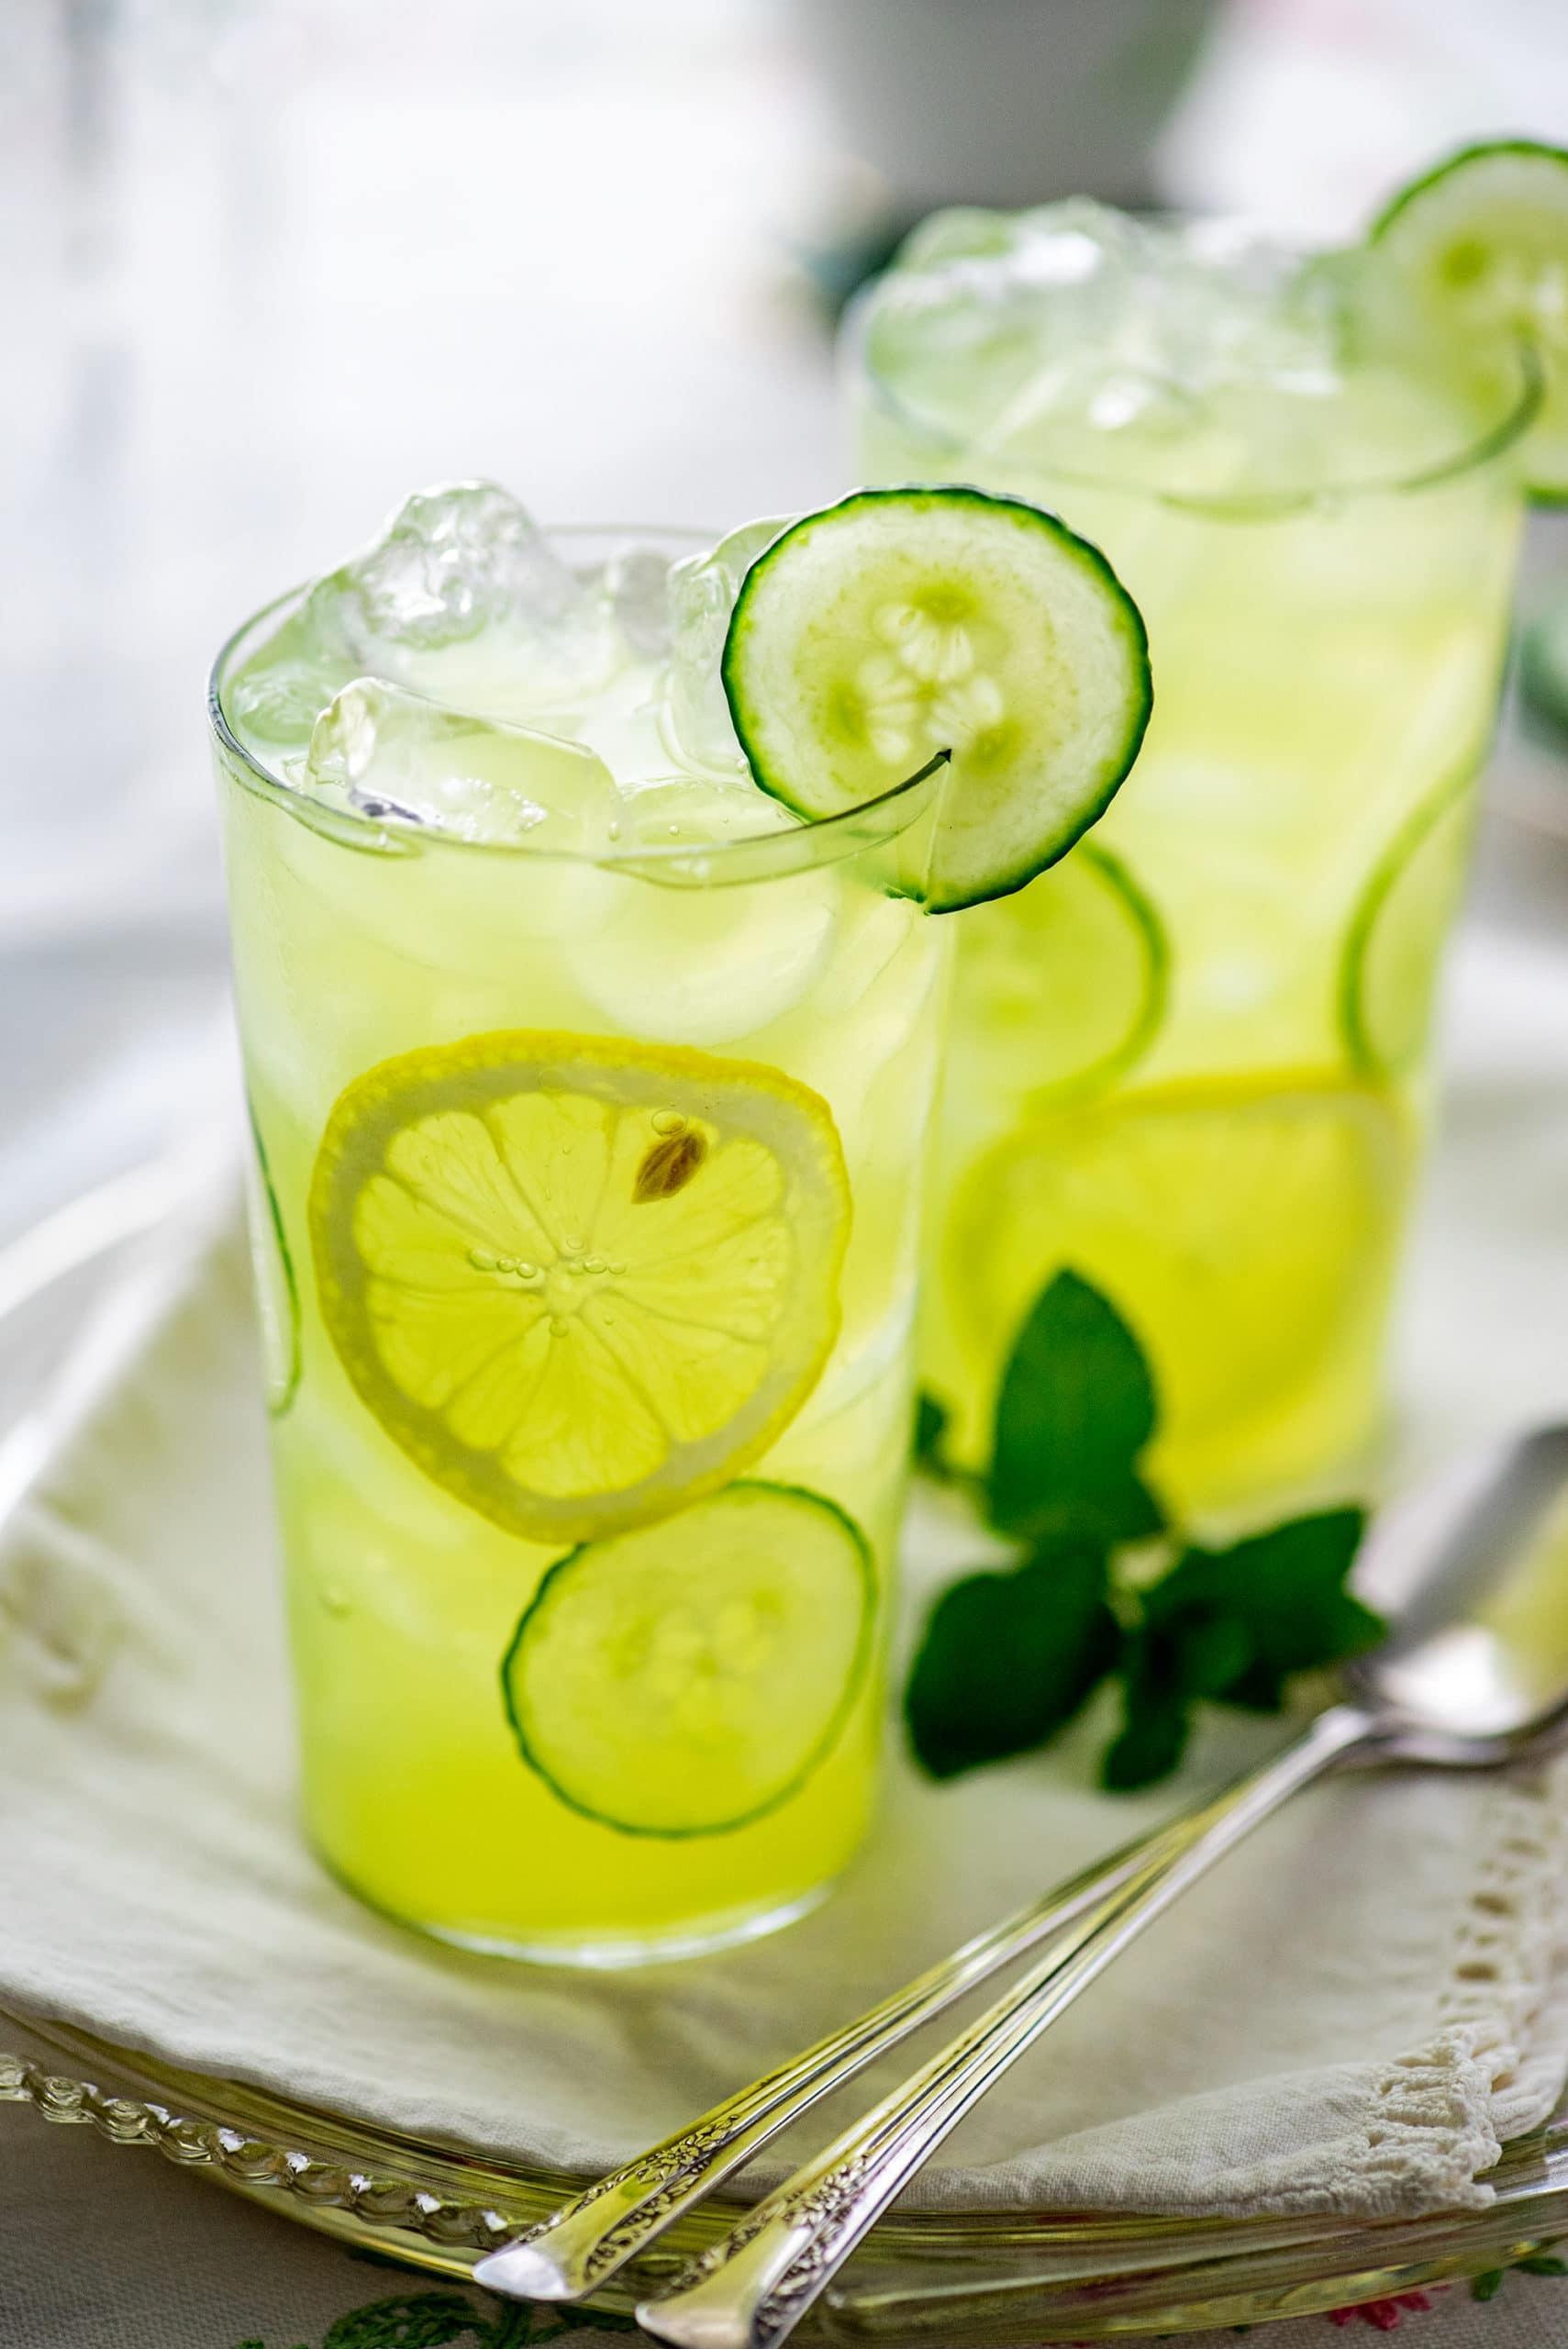 Cucumber Lemonade 7559 2 2000px scaled - The Best Homemade Berry Iced Tea